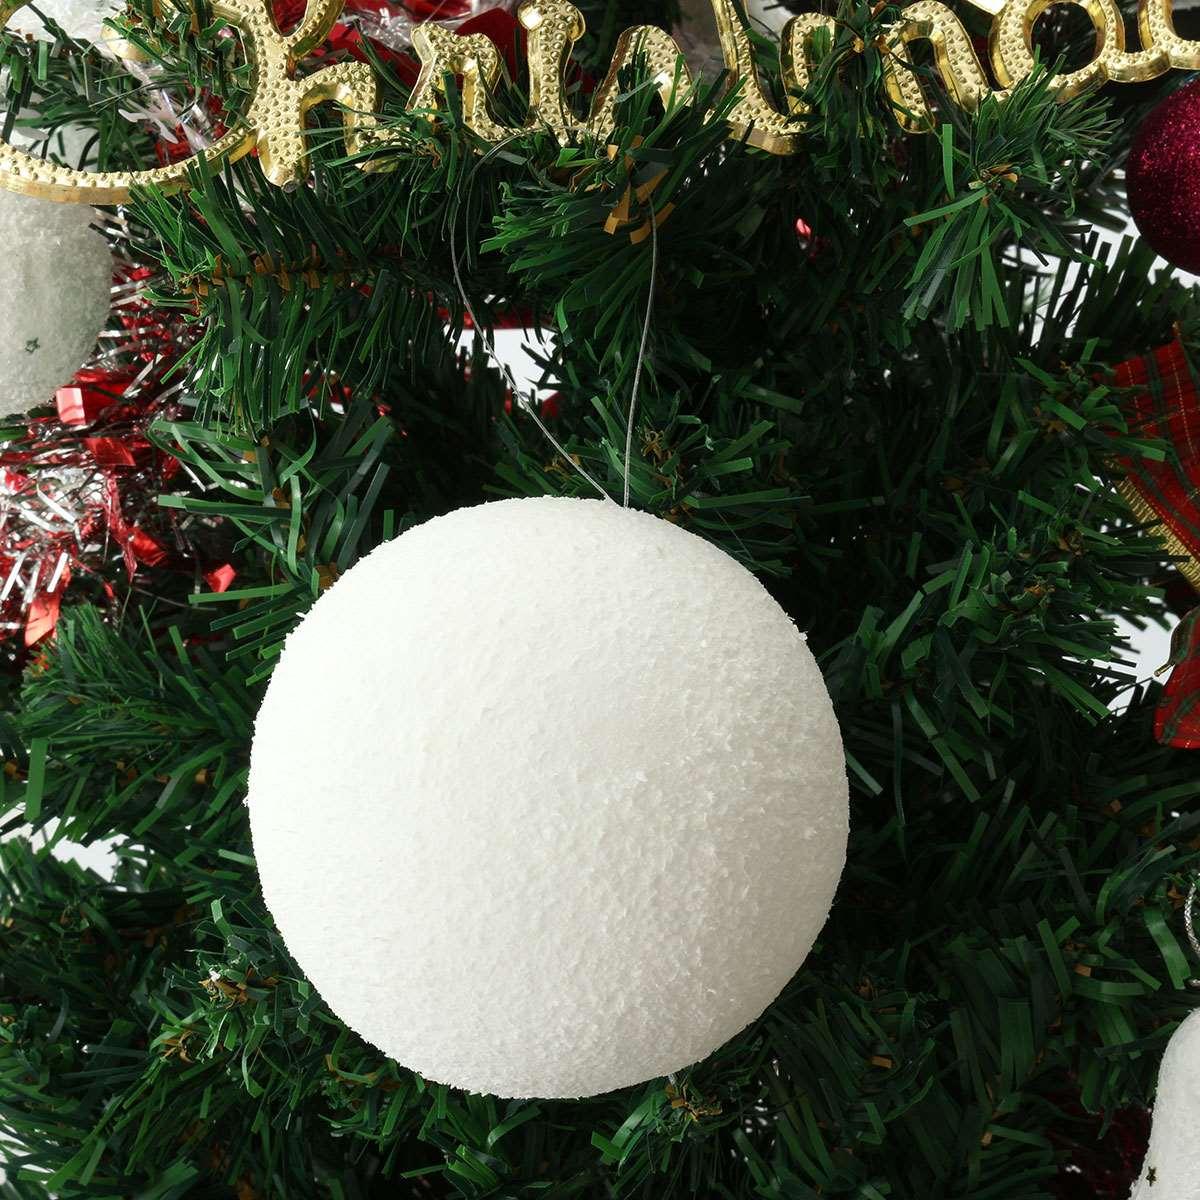 743 tags christmas decorations festival holiday christmas tree views - 6pcs Bag 6cm 8cm 10cm Snowball Christmas Decoration Supplies Tree Pendants New Year